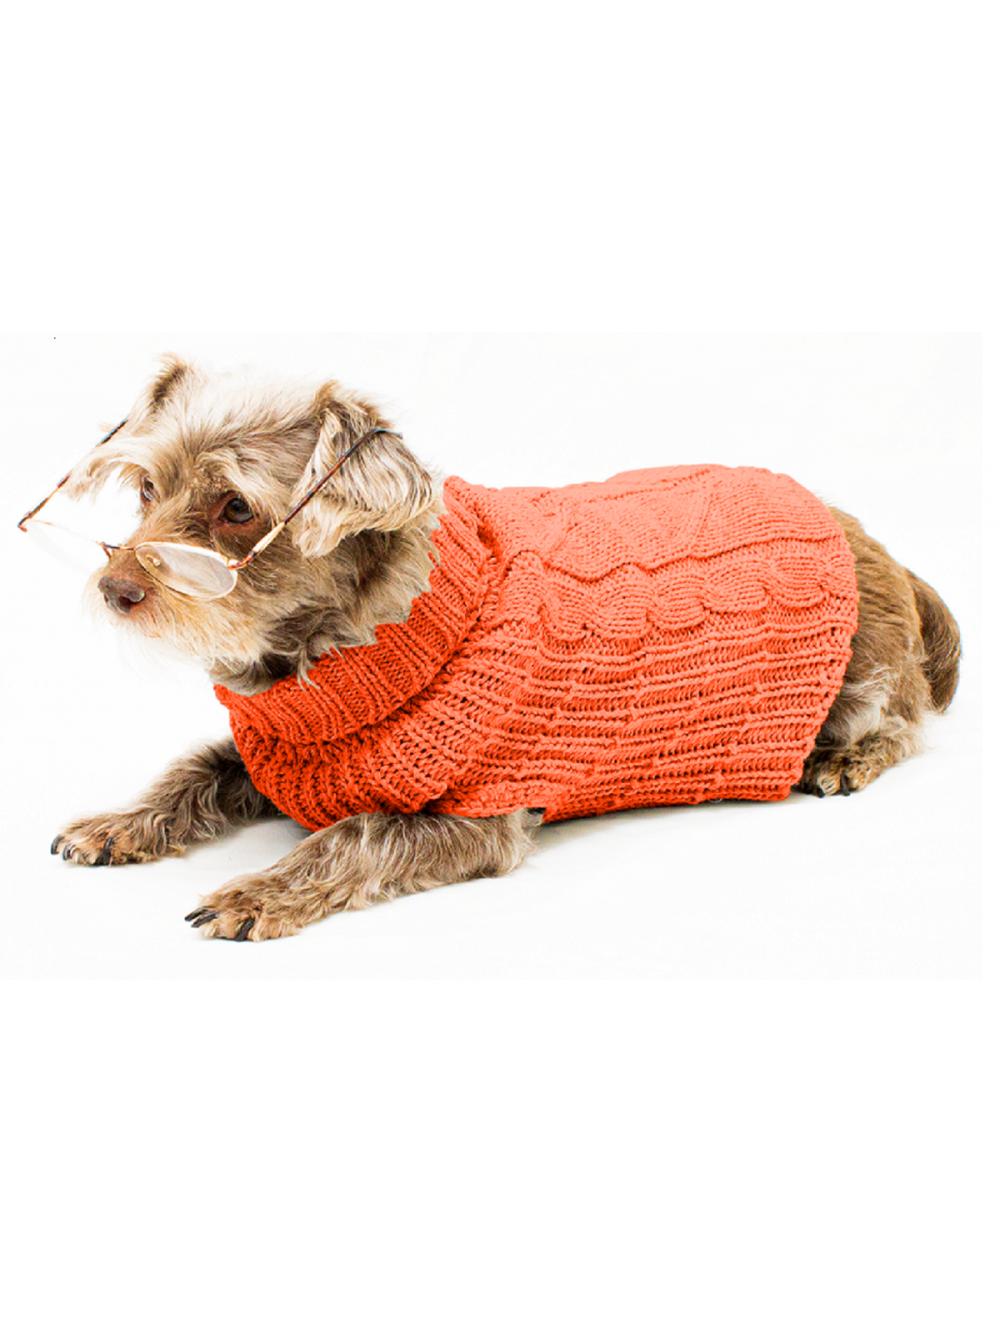 Ropa para perro Saco Cody Naranja Talla M - Ciudaddemascotas.